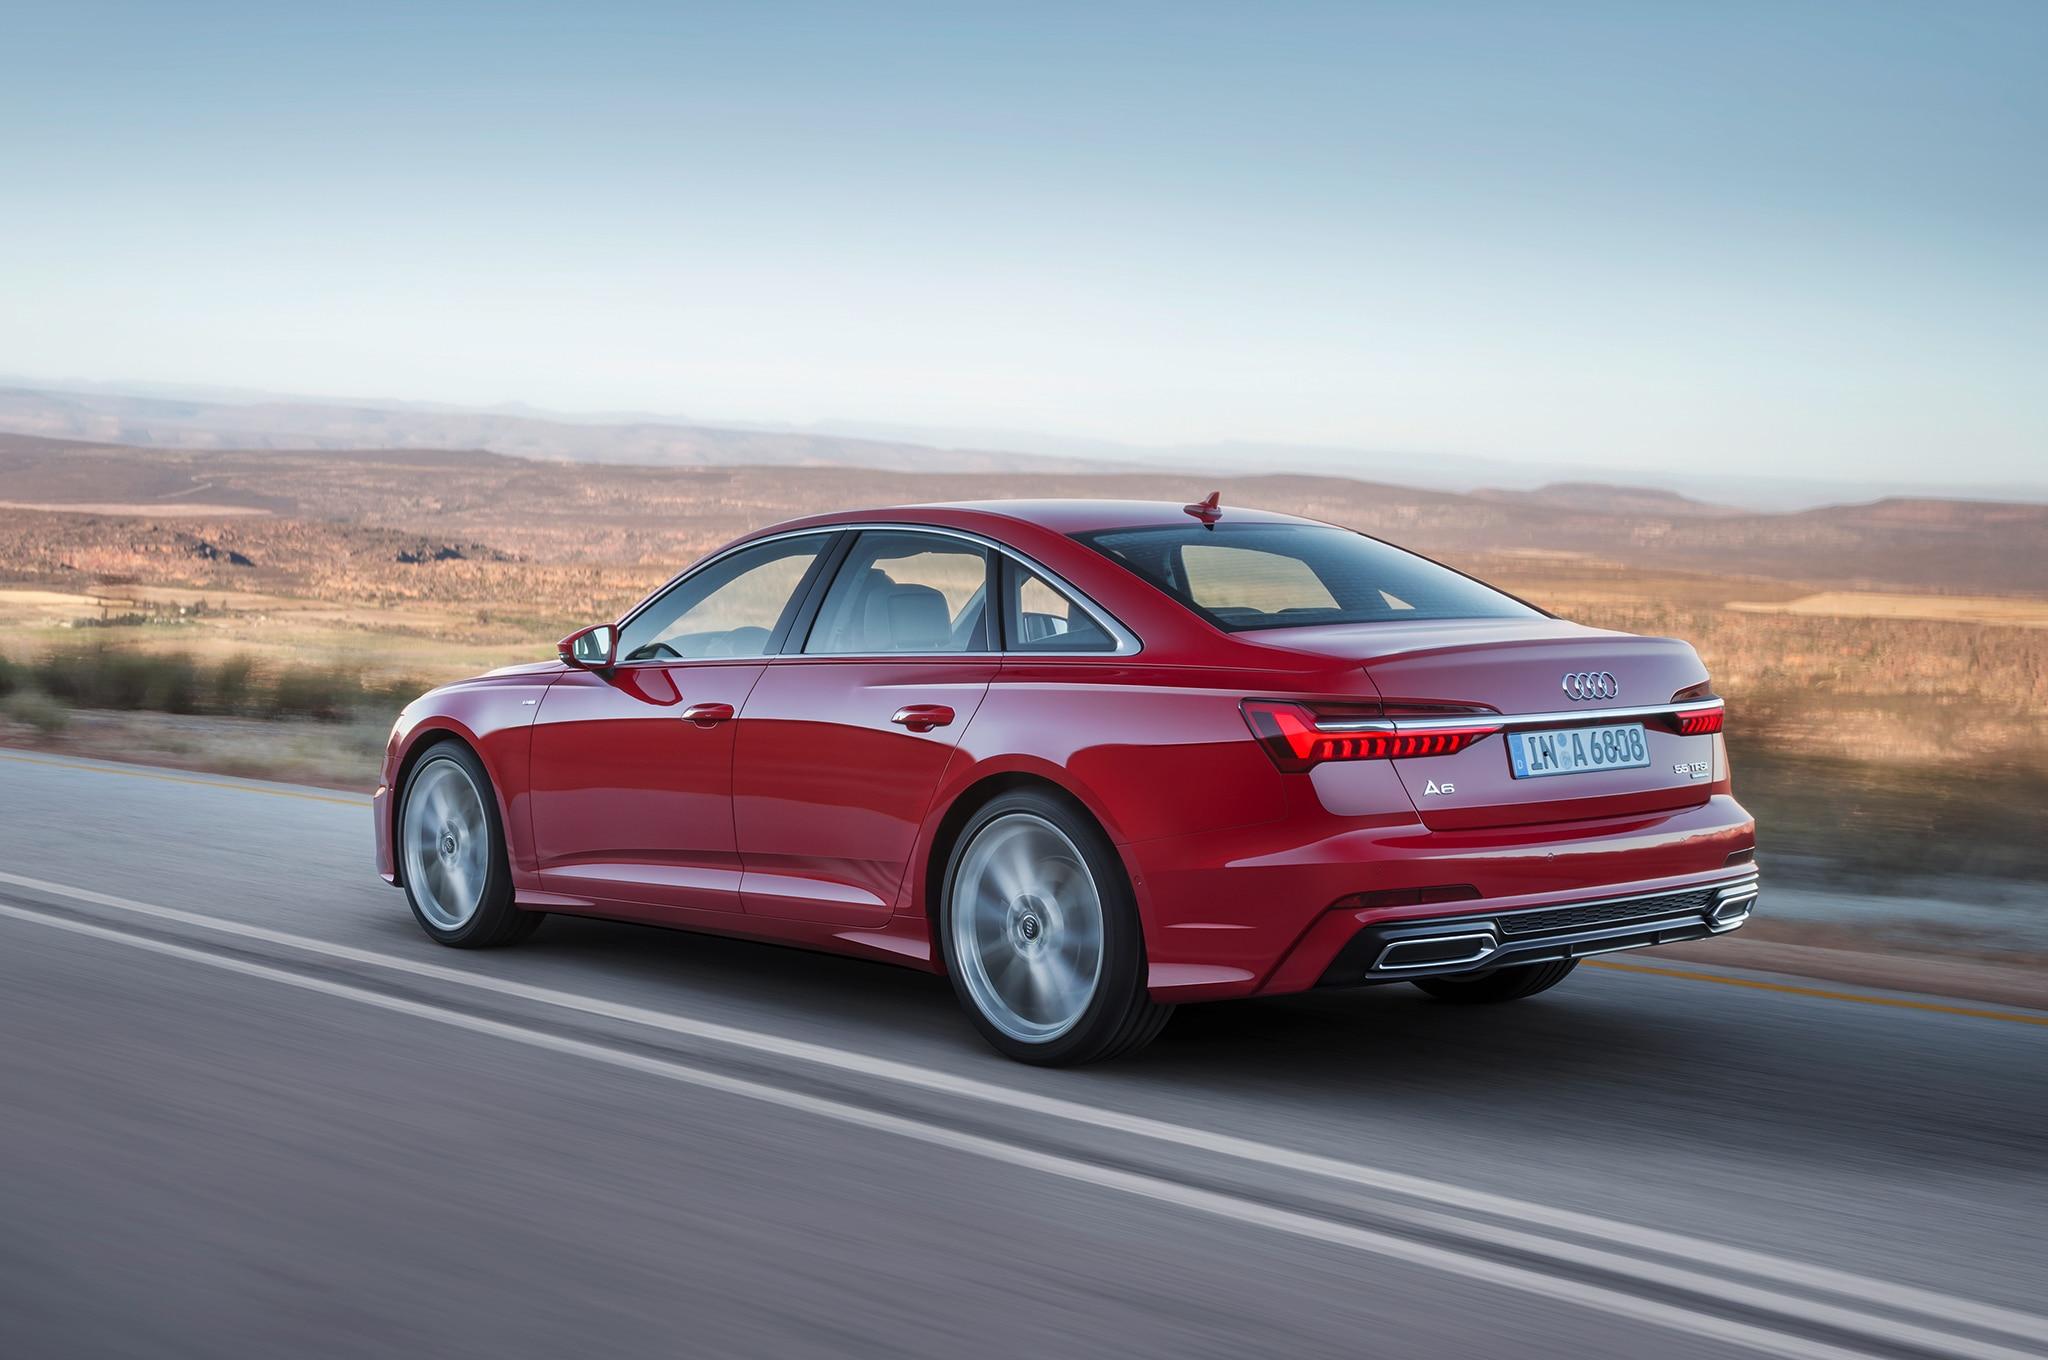 2019 Audi A6 Rear Three Quarter In Motion